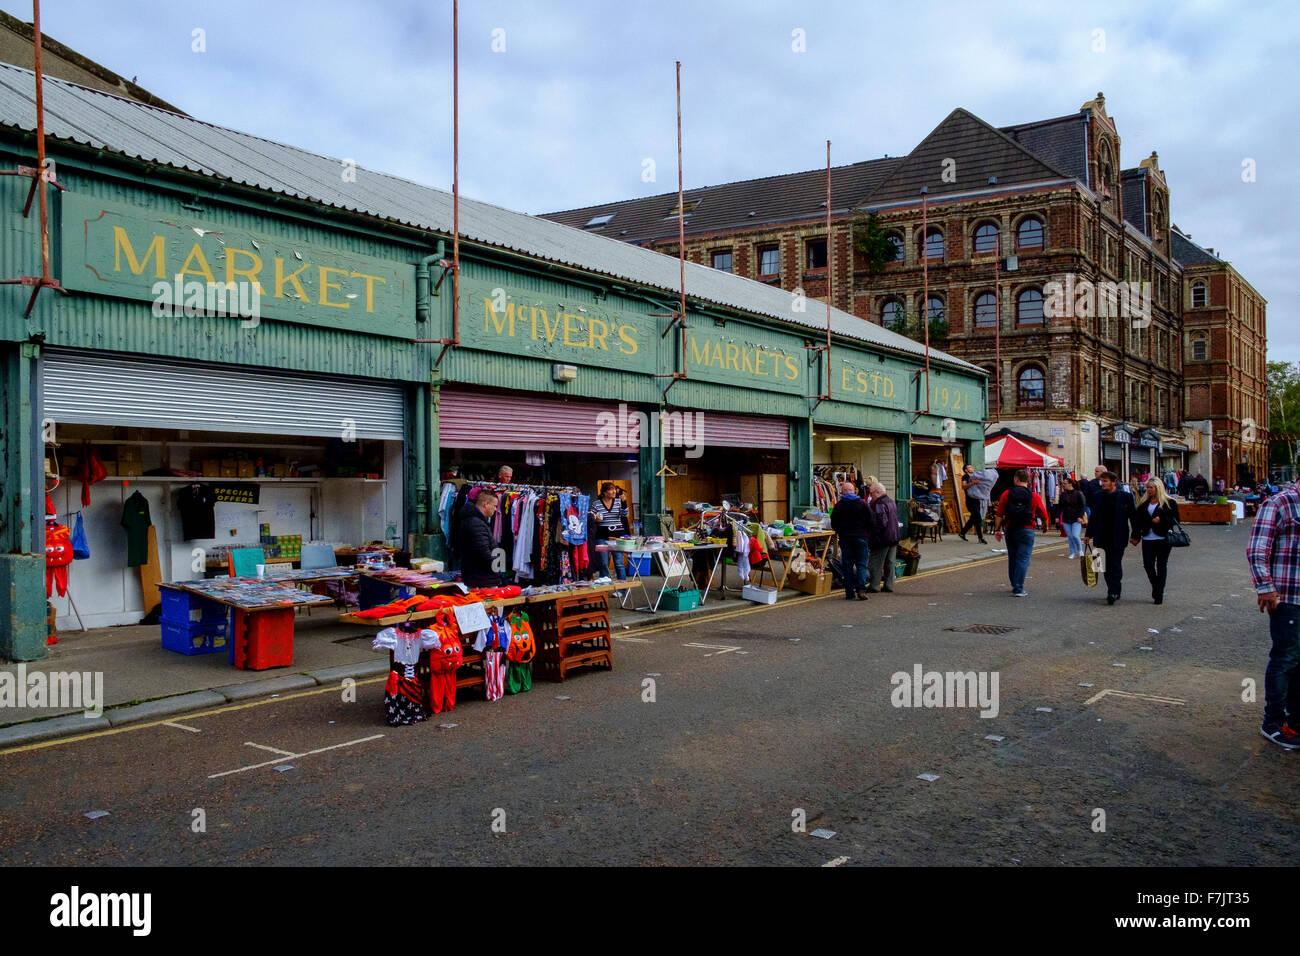 mcivers mc ivers market markets glasgow scotland - Stock Image